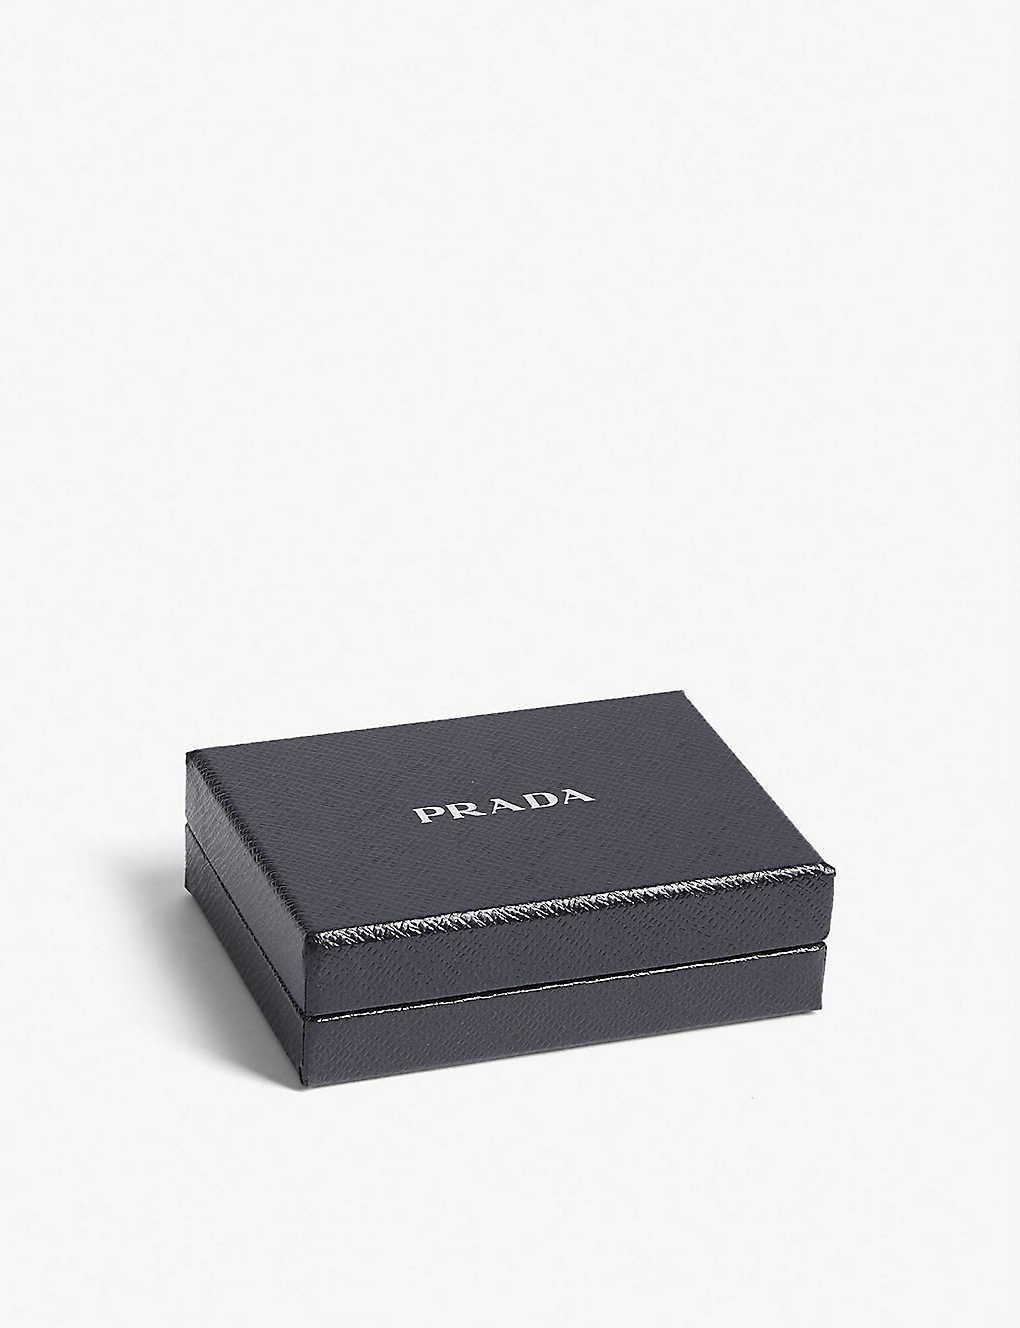 05e3bca91ea8 PRADA - Eye patch Saffiano leather wallet   Selfridges.com